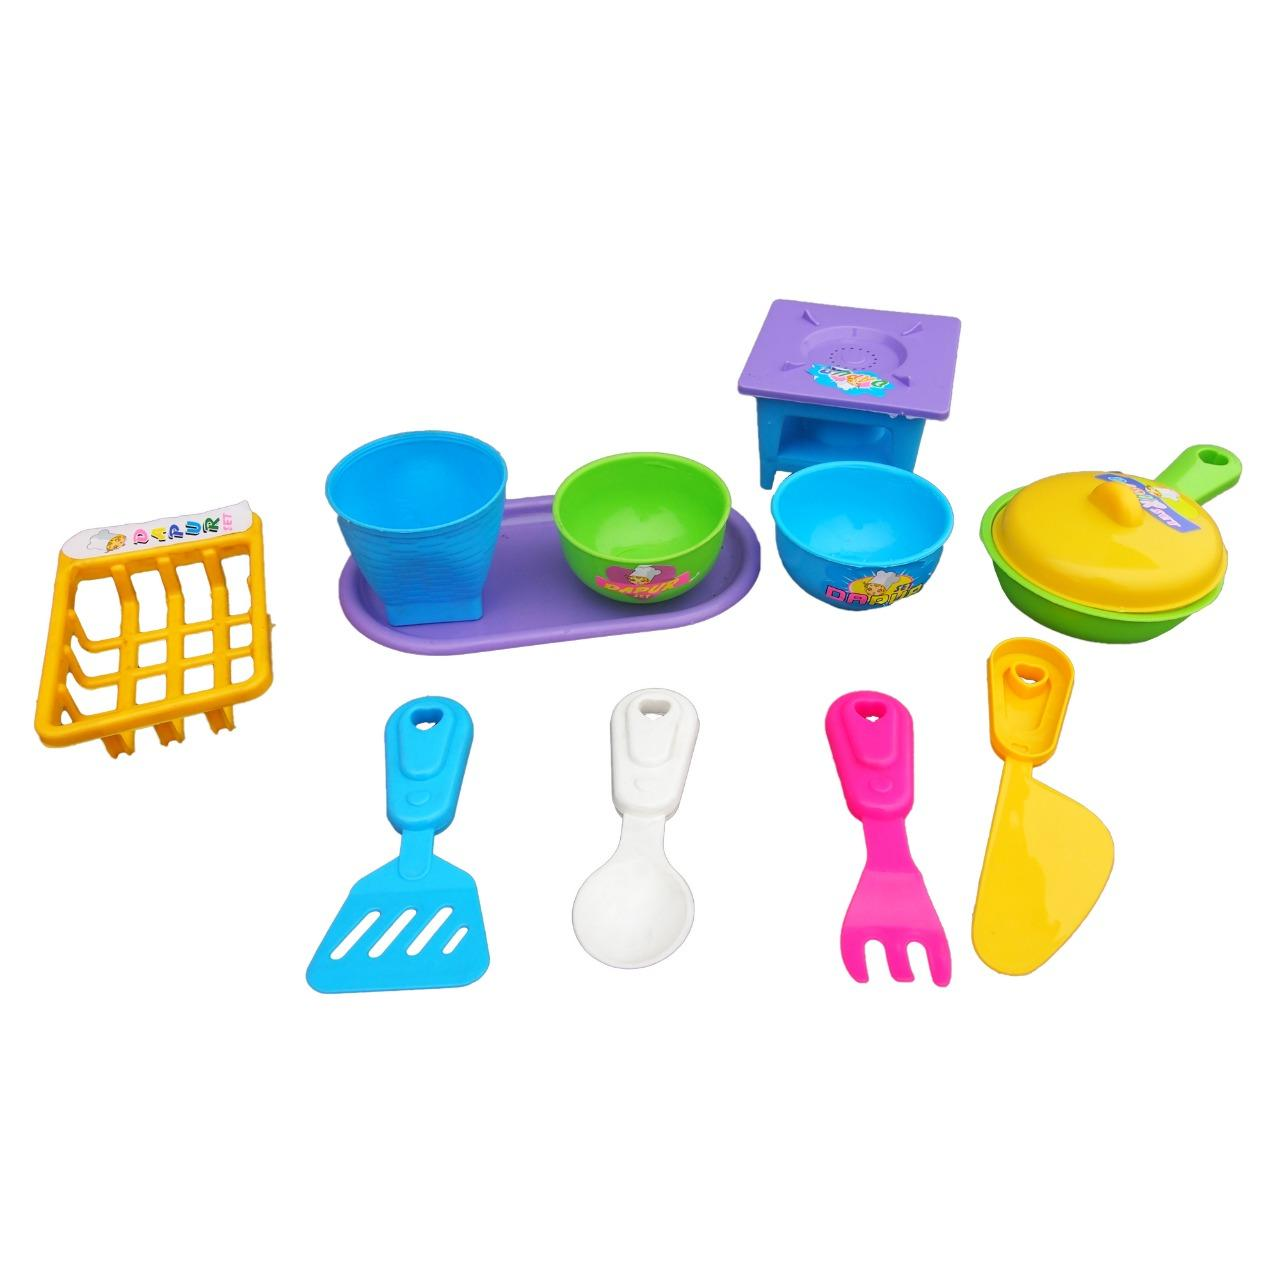 Mainan Anak Dapur Set Kantong Murah Lazada Birthday Promo